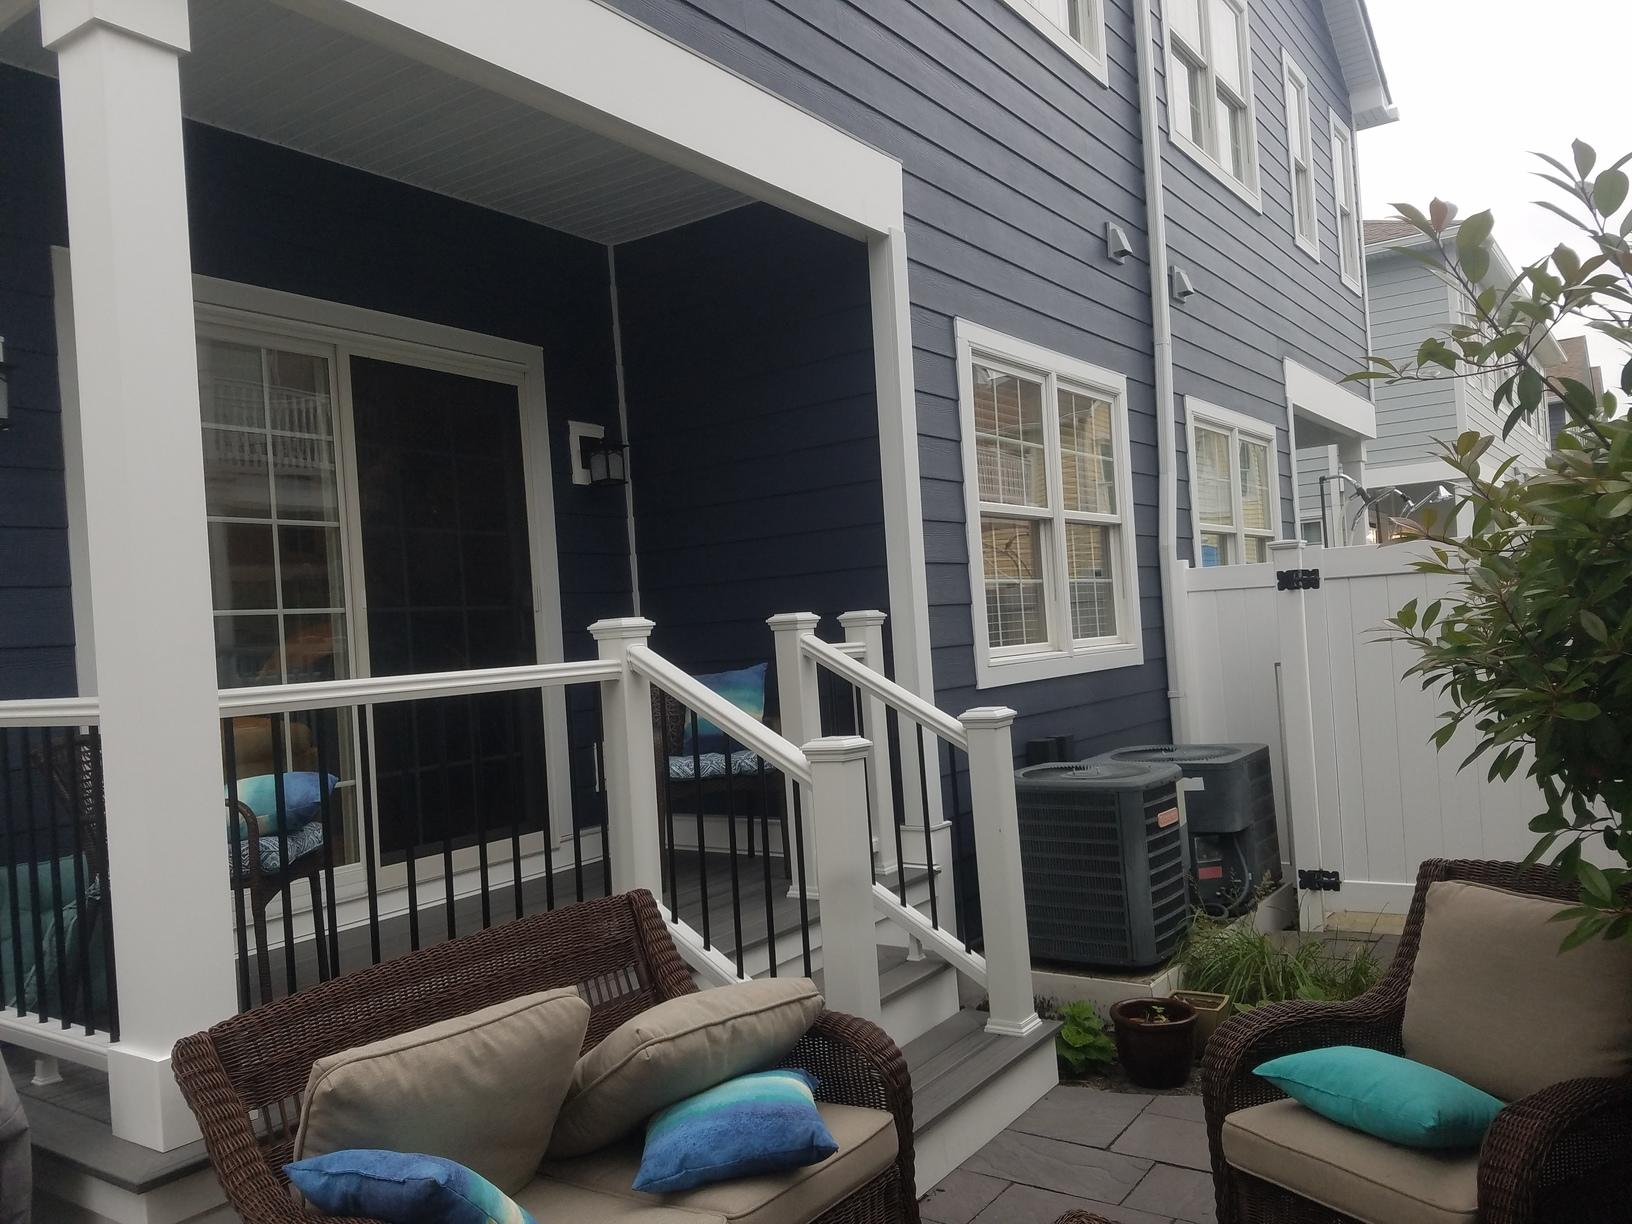 New Siding Around Patio Area of Beach Home